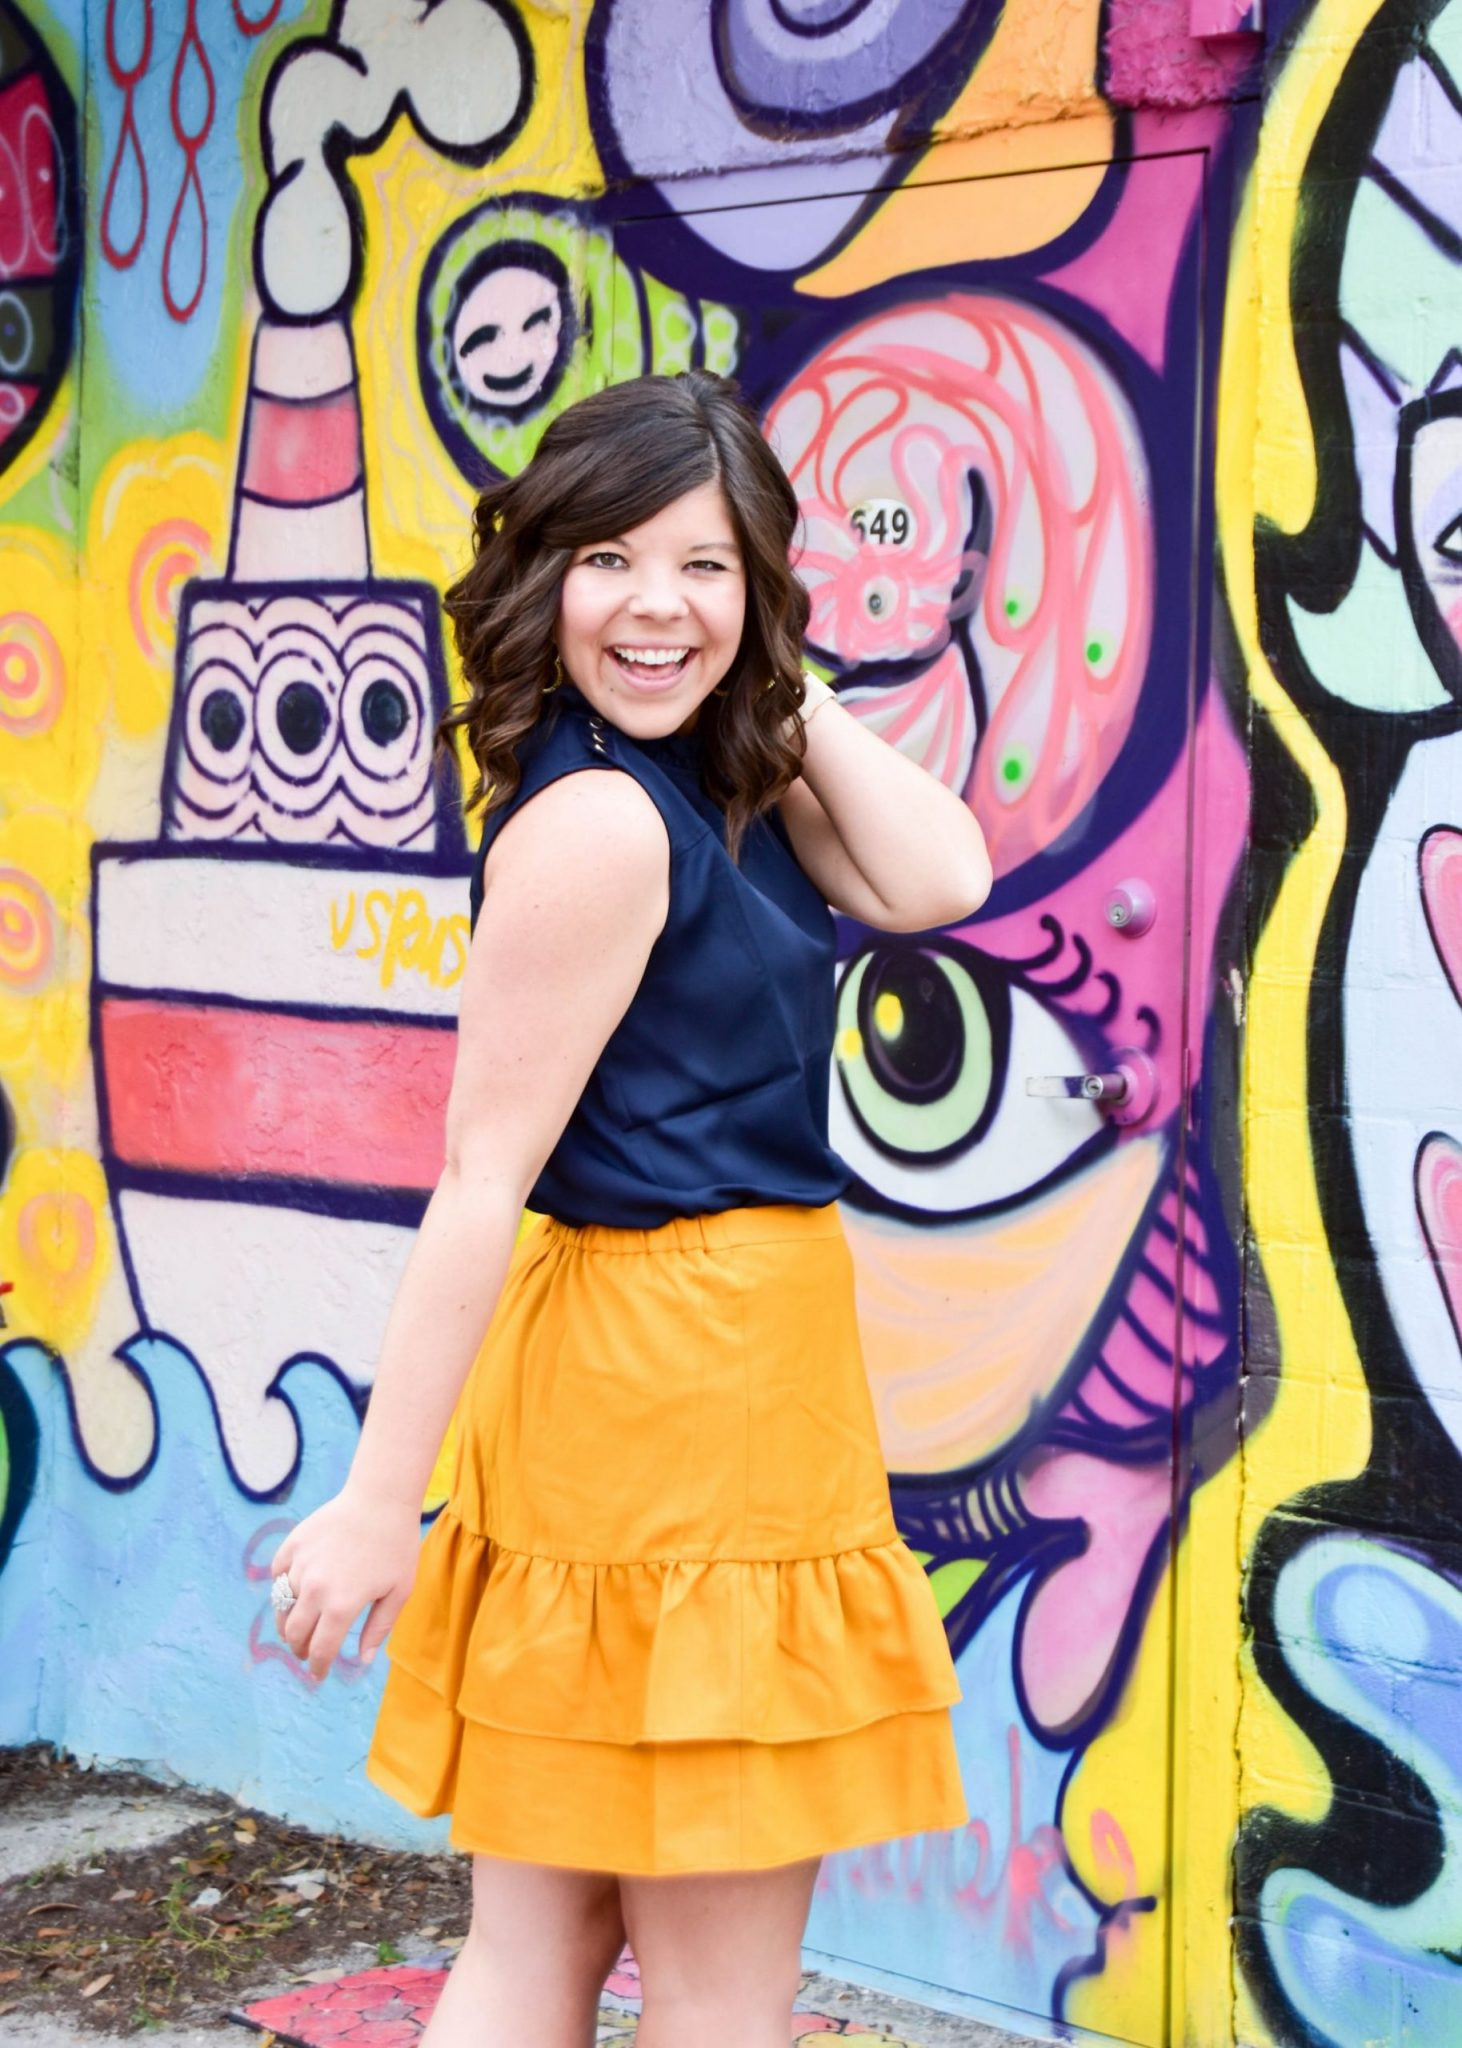 Workweek Chic: Yellow Ruffles + A Link-Up!